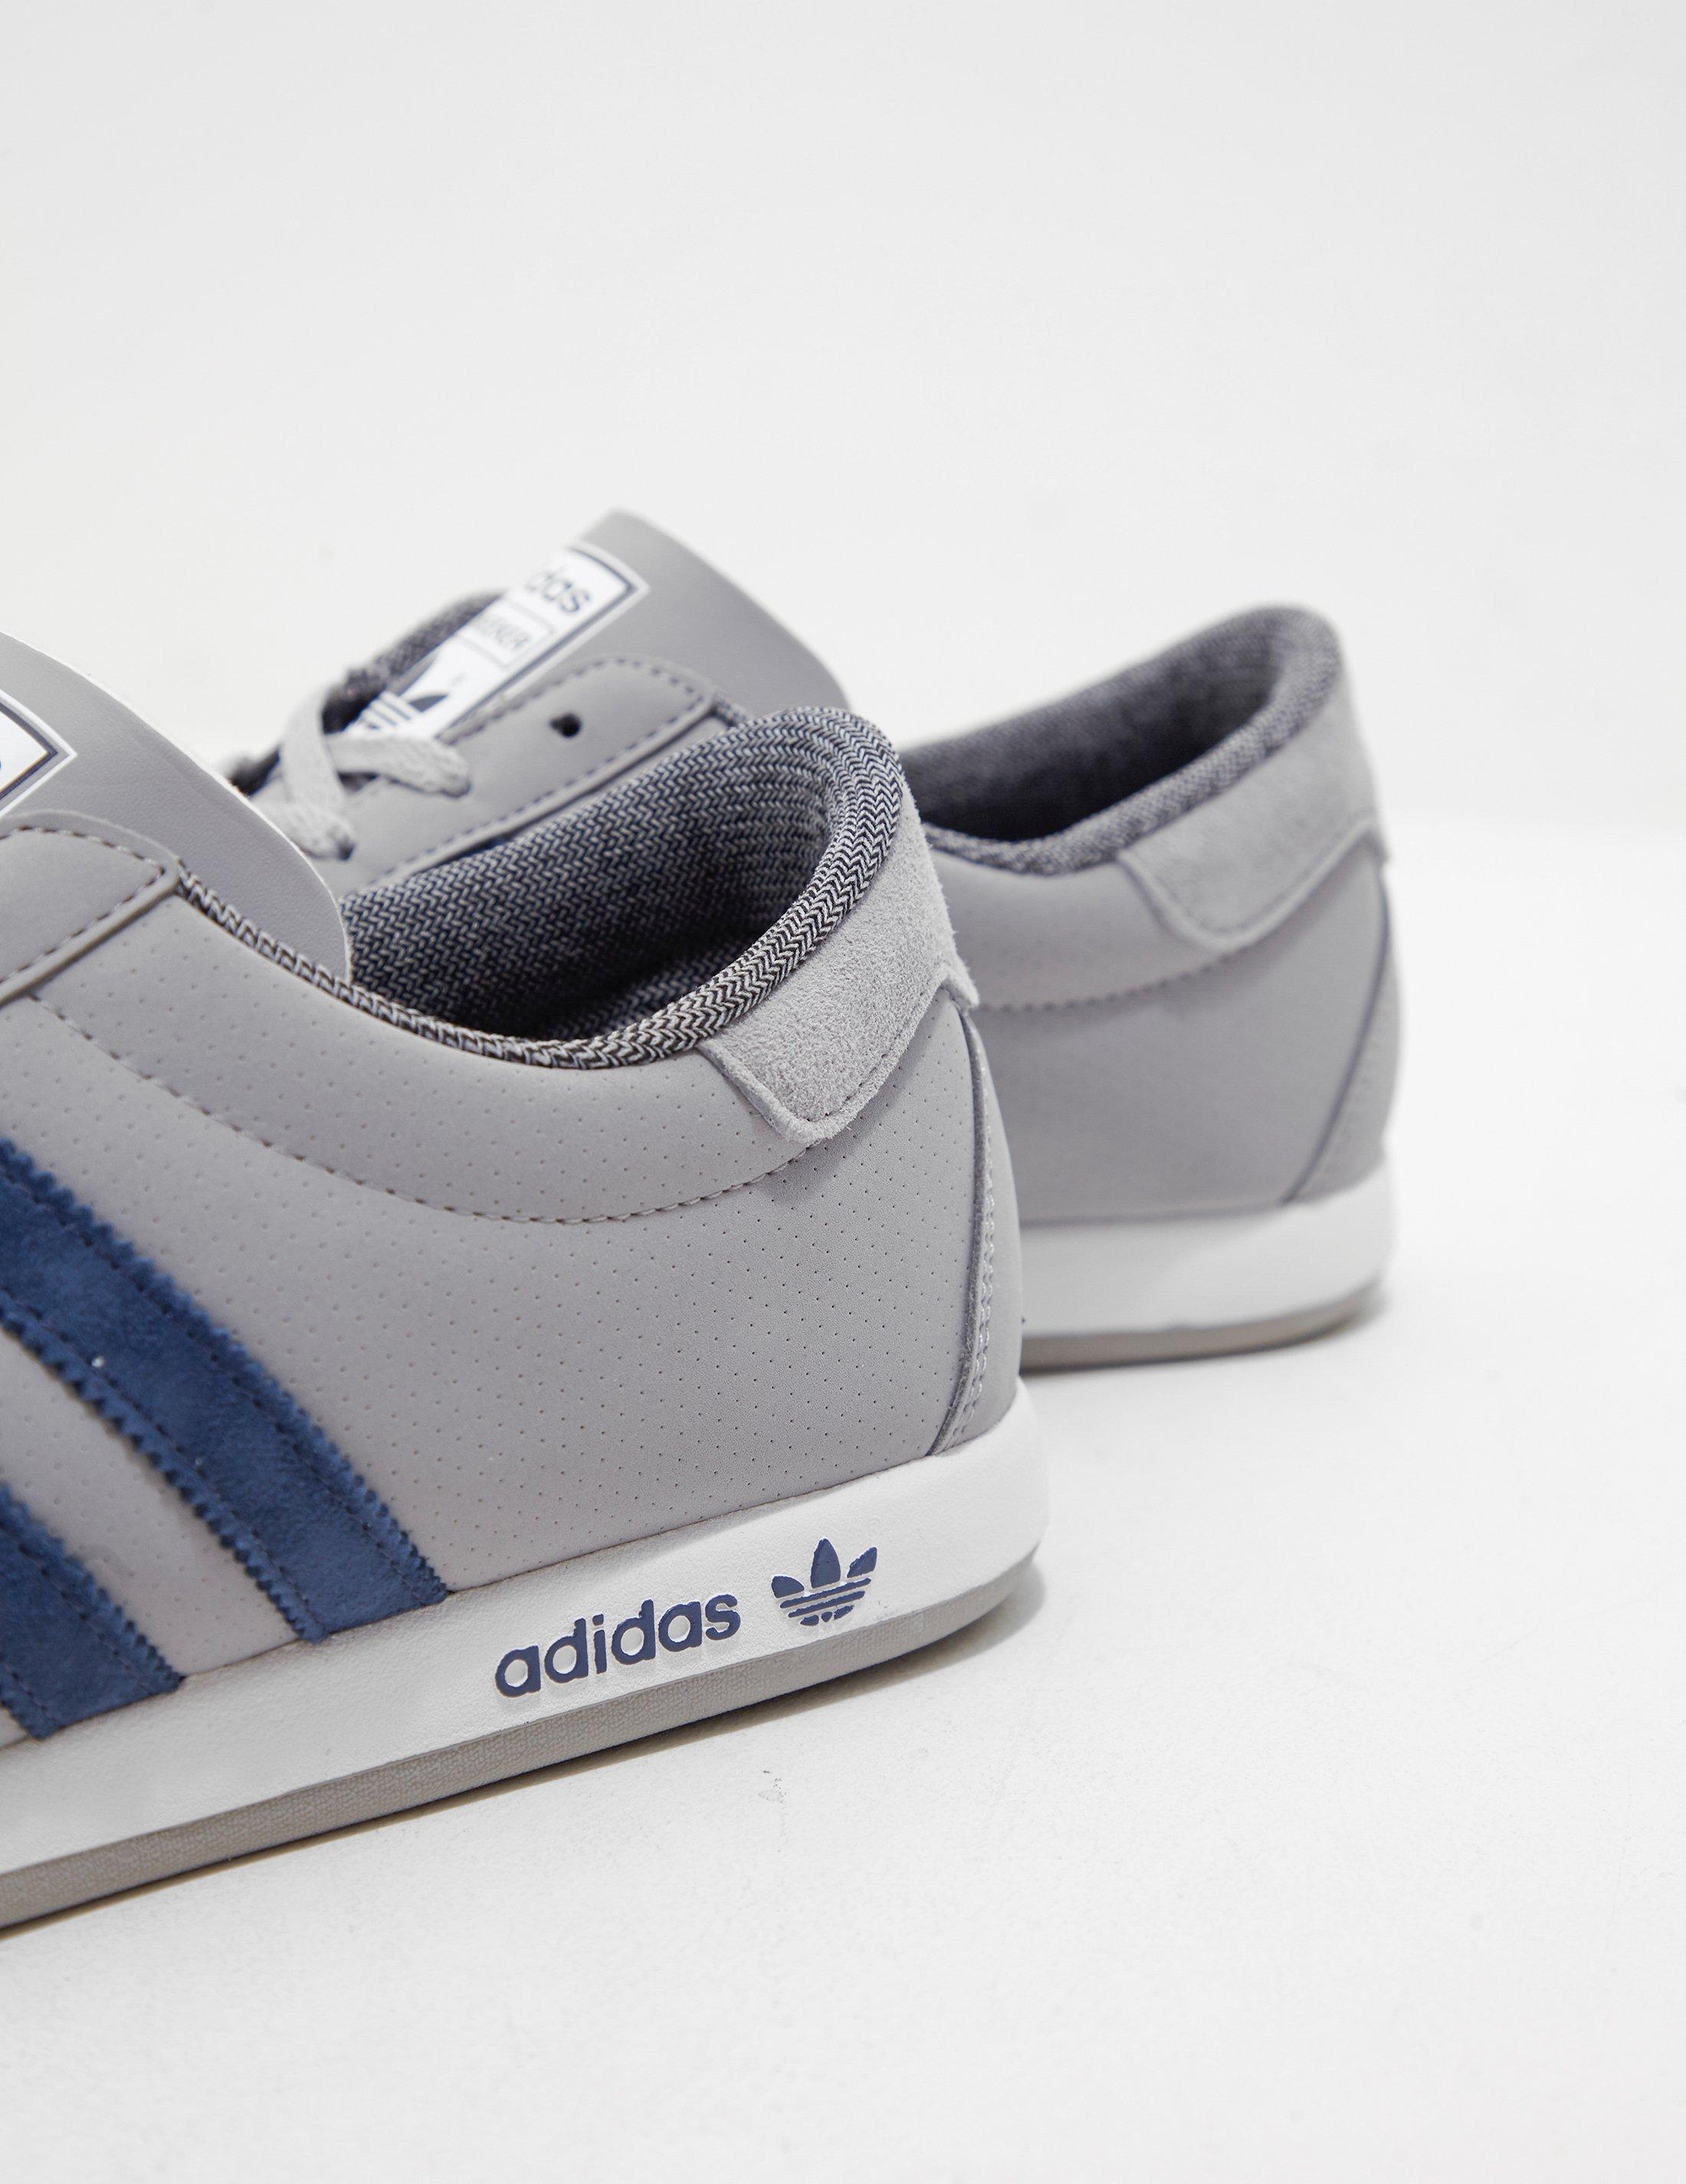 adidas Originals Leather The Sneeker